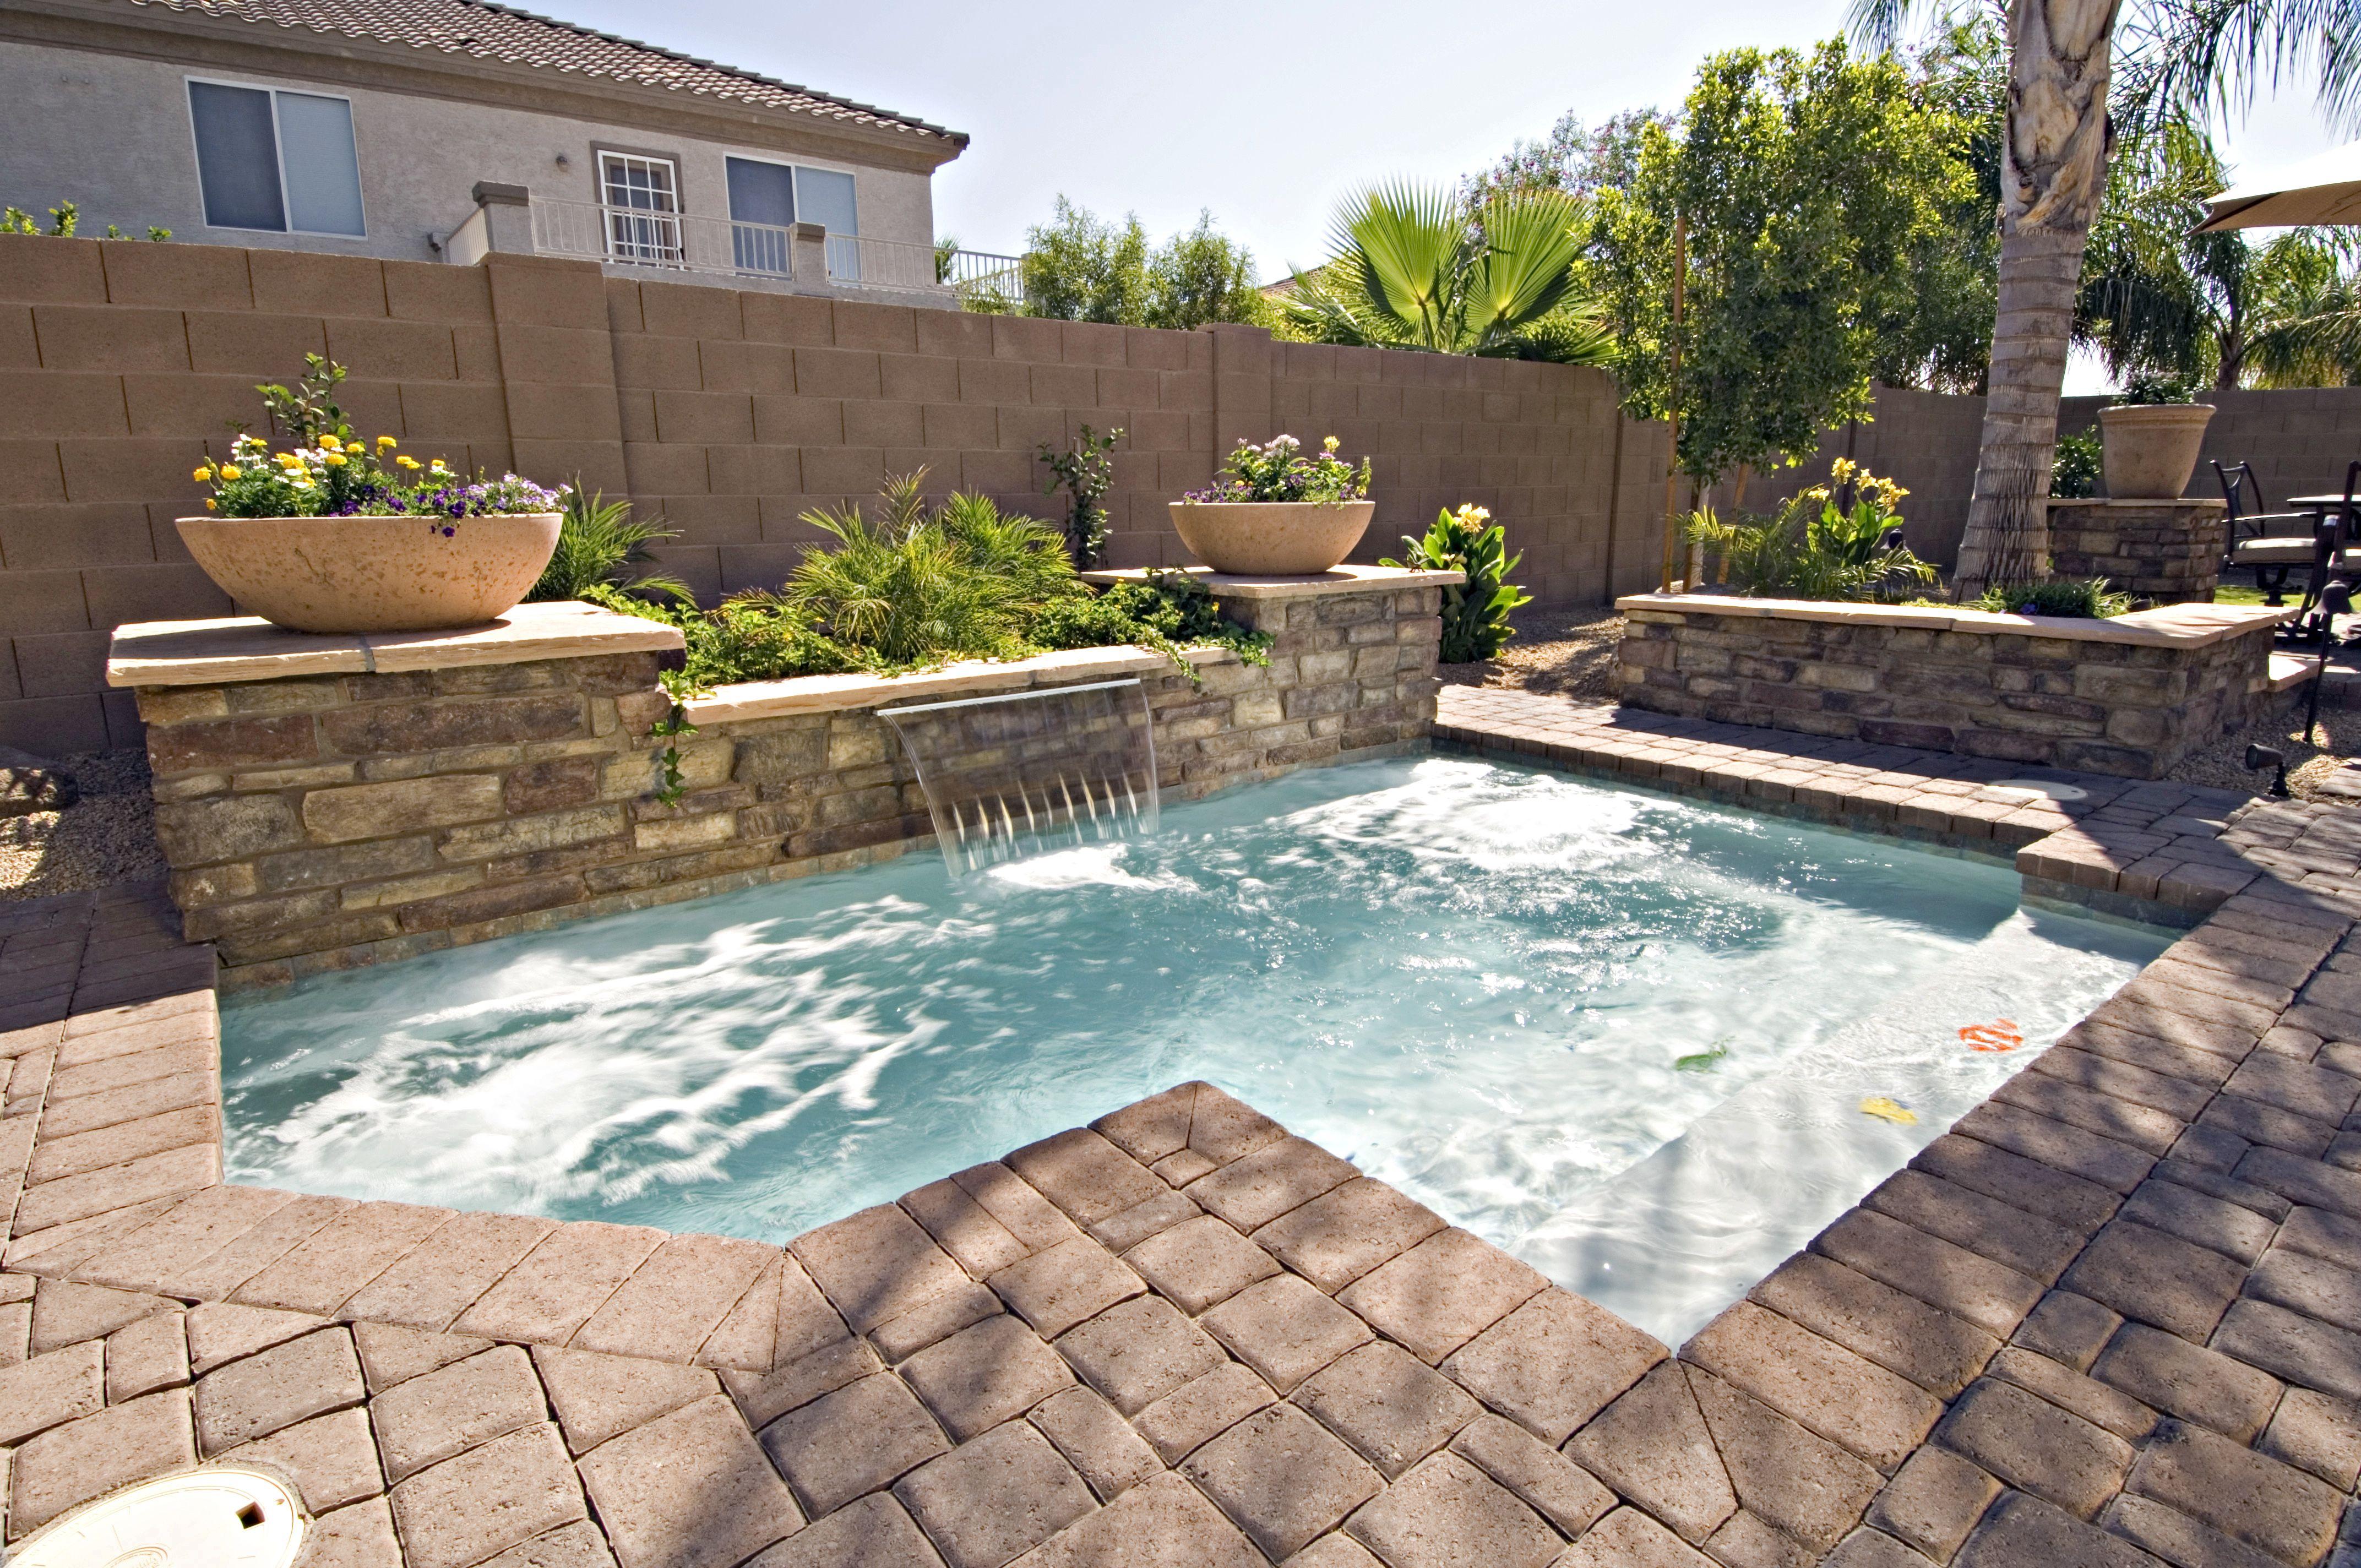 23 Amazing And Splendid Small Pool Ideas Small Inground Pool